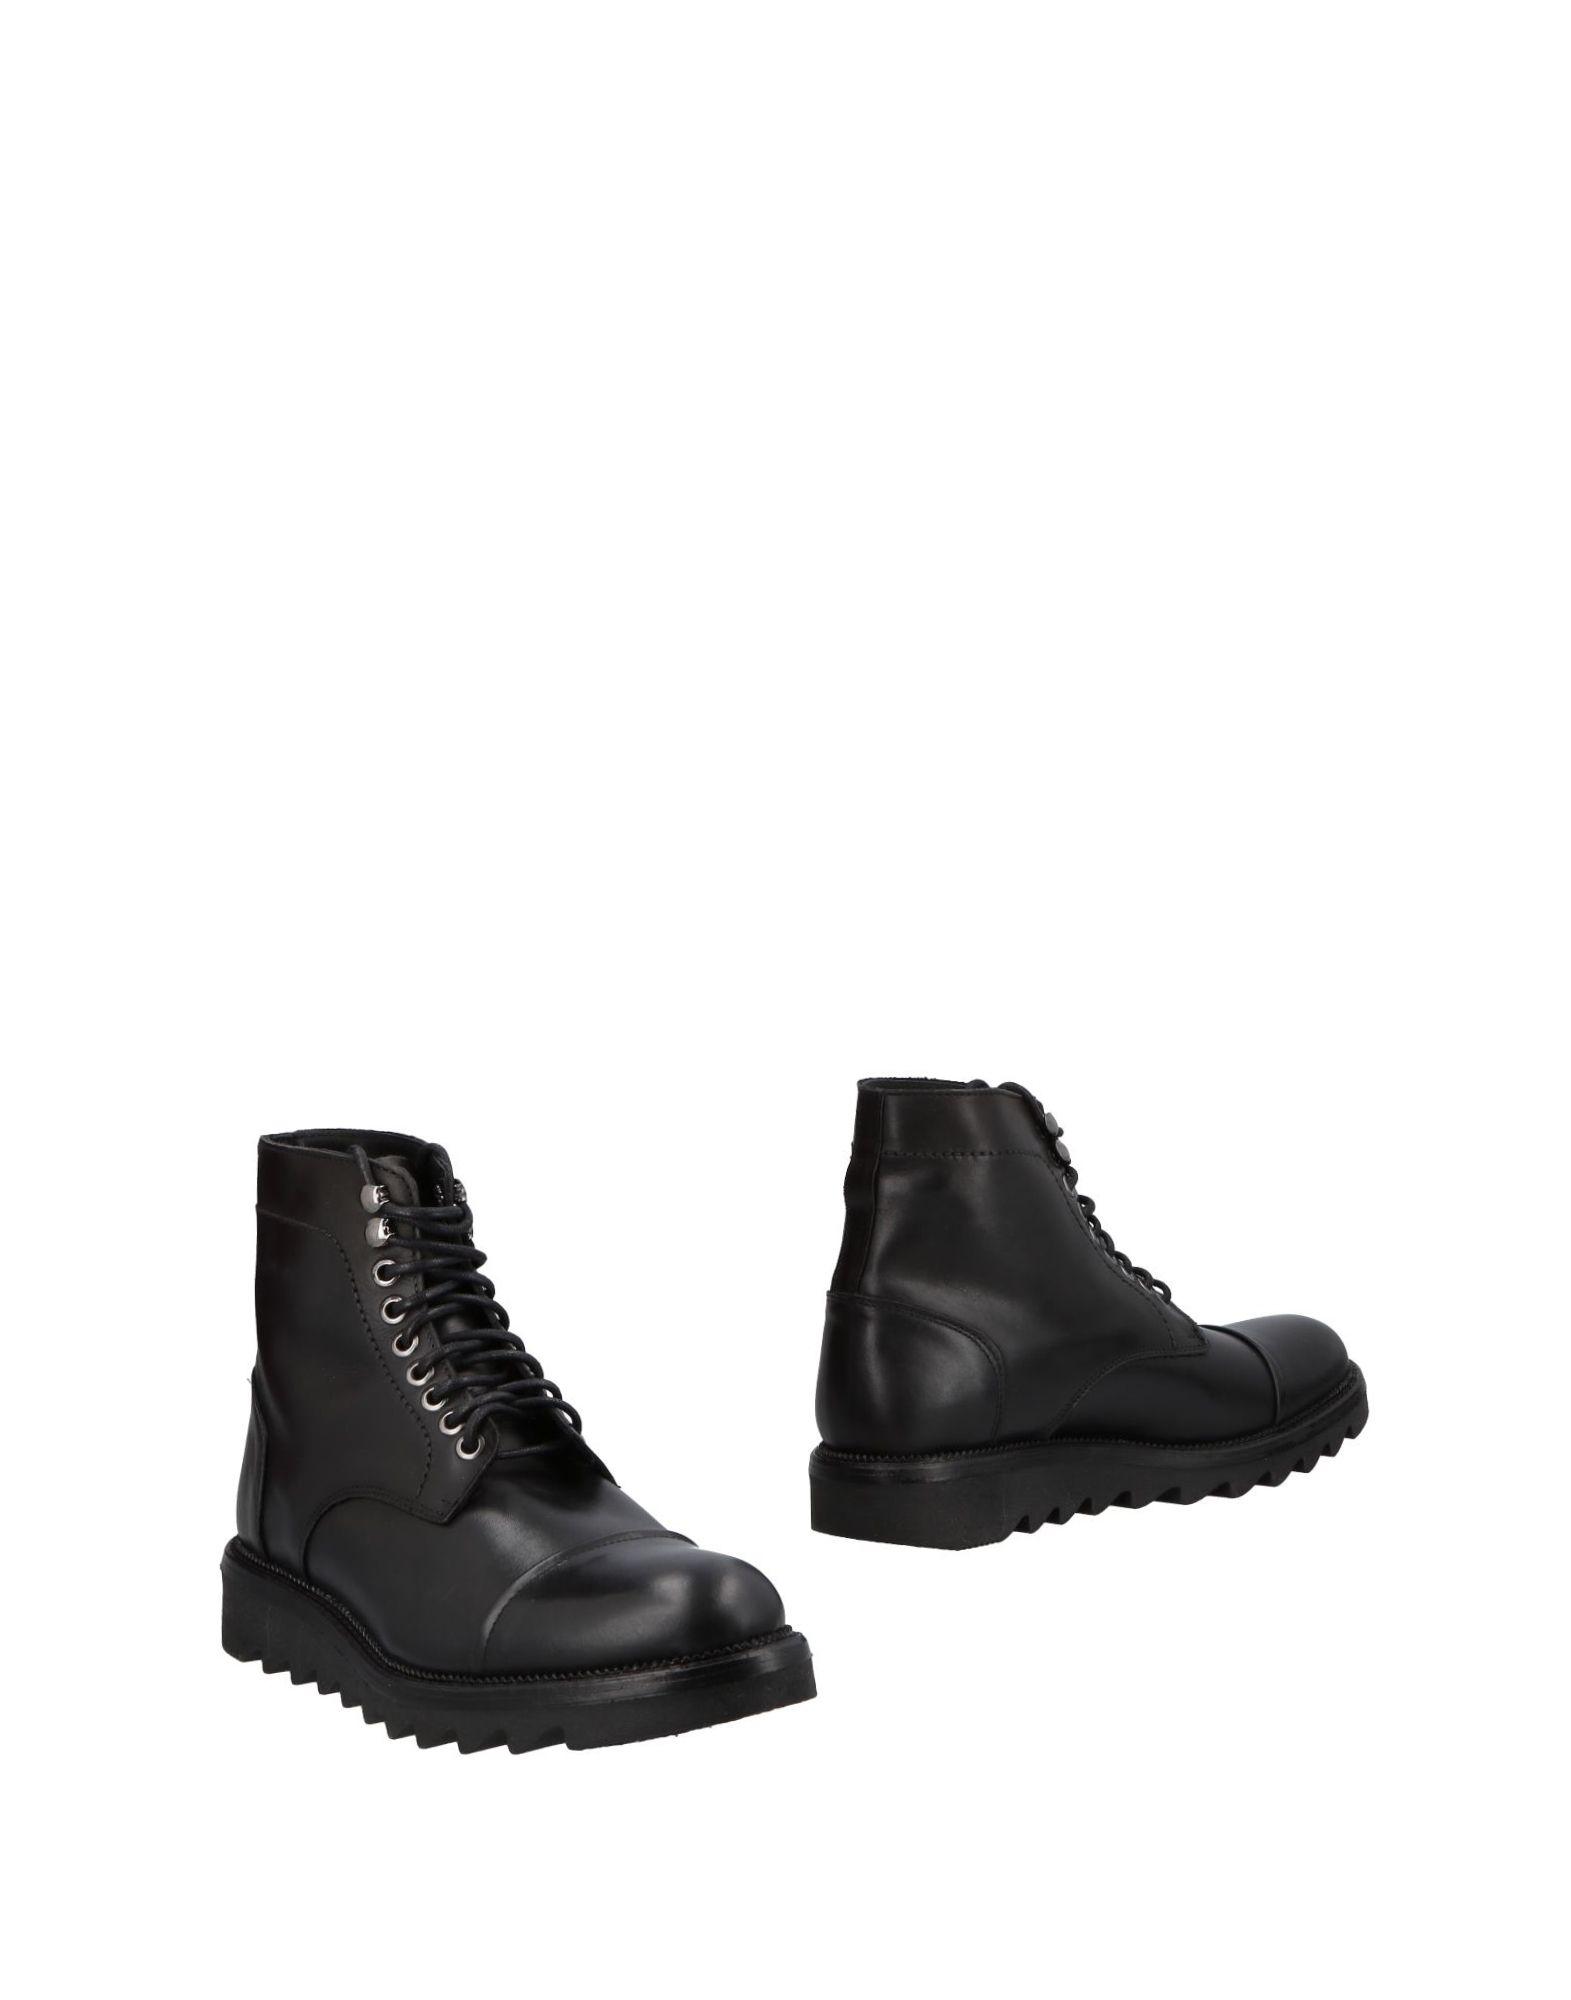 Rabatt echte Schuhe Bottega Marchigiana Stiefelette  Herren  Stiefelette 11494331TL 582063